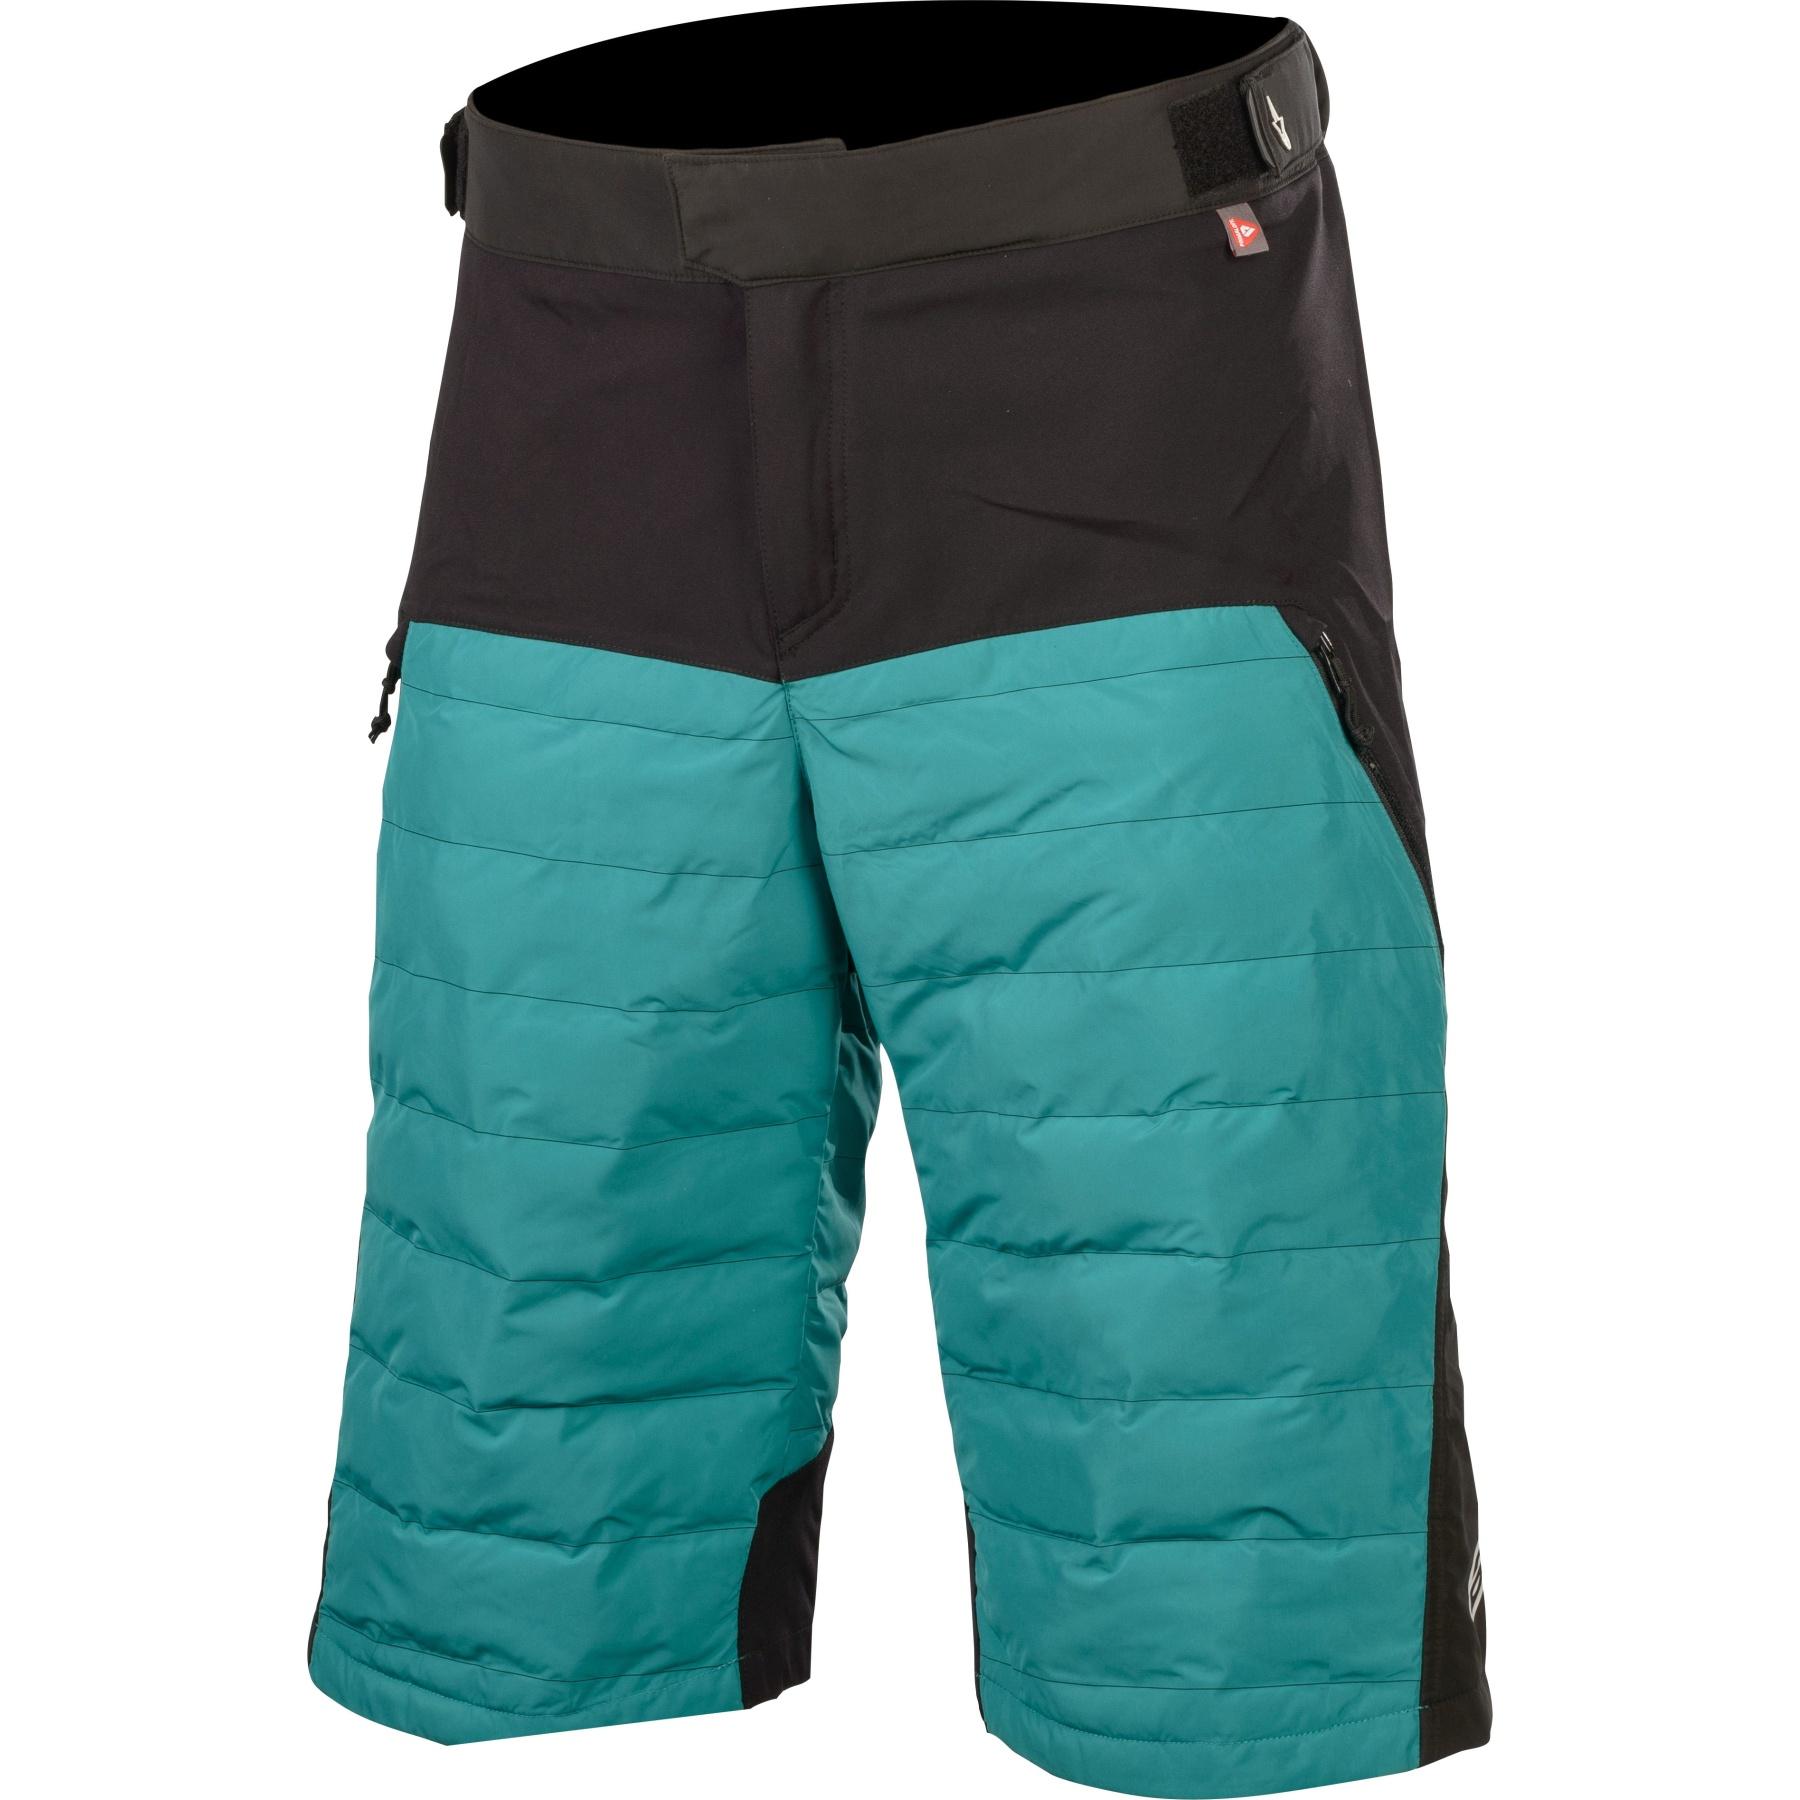 Alpinestars Denali Shorts - emerald/black